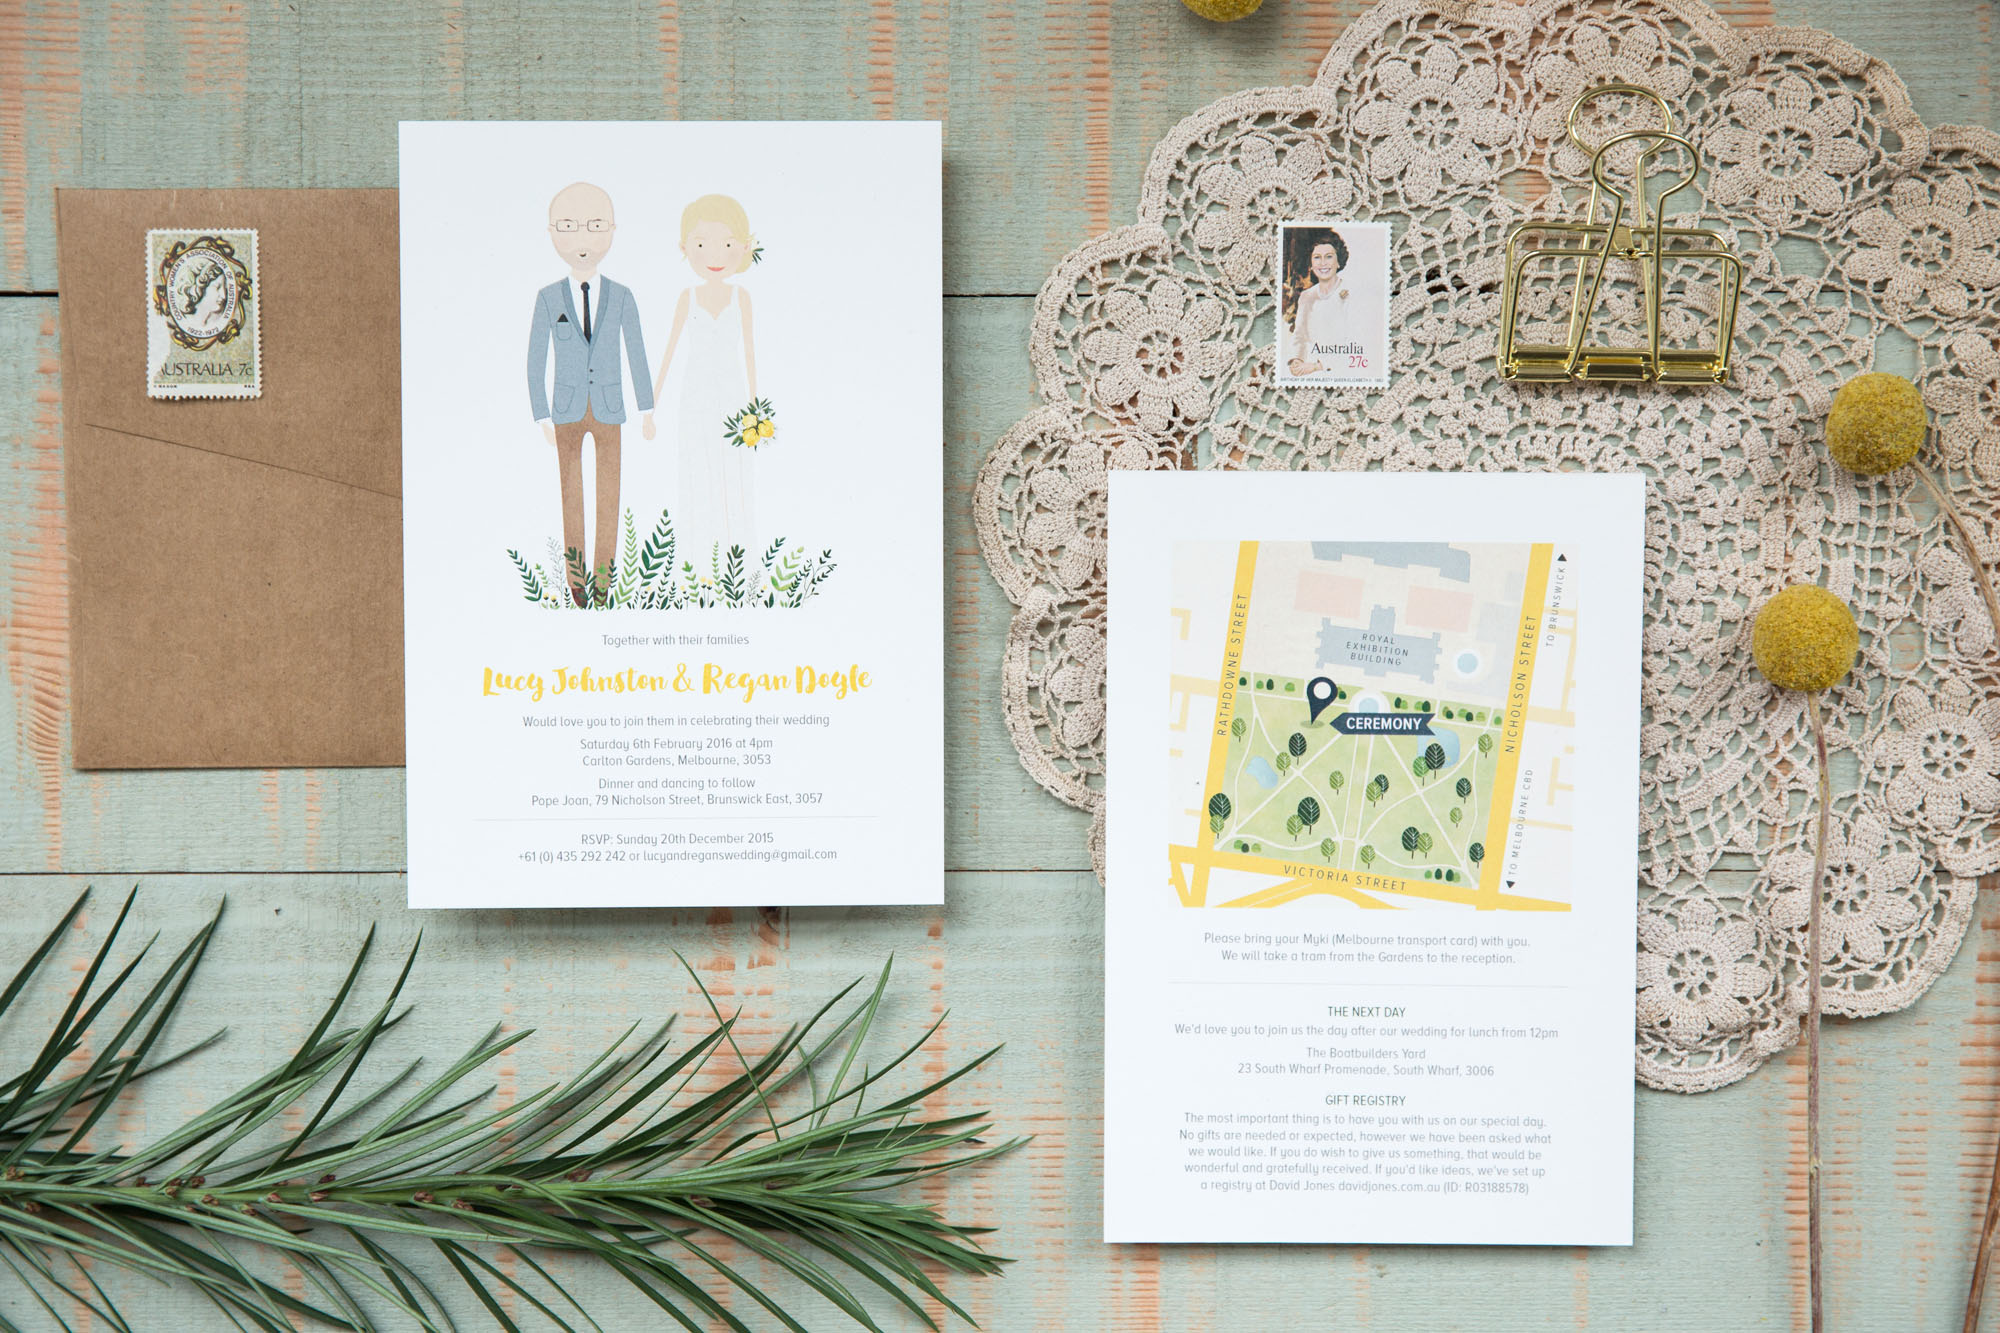 Custom, illustrated wedding stationery. Invitation featuring portrait illustration and Information card featuring illustrated map of wedding venue.